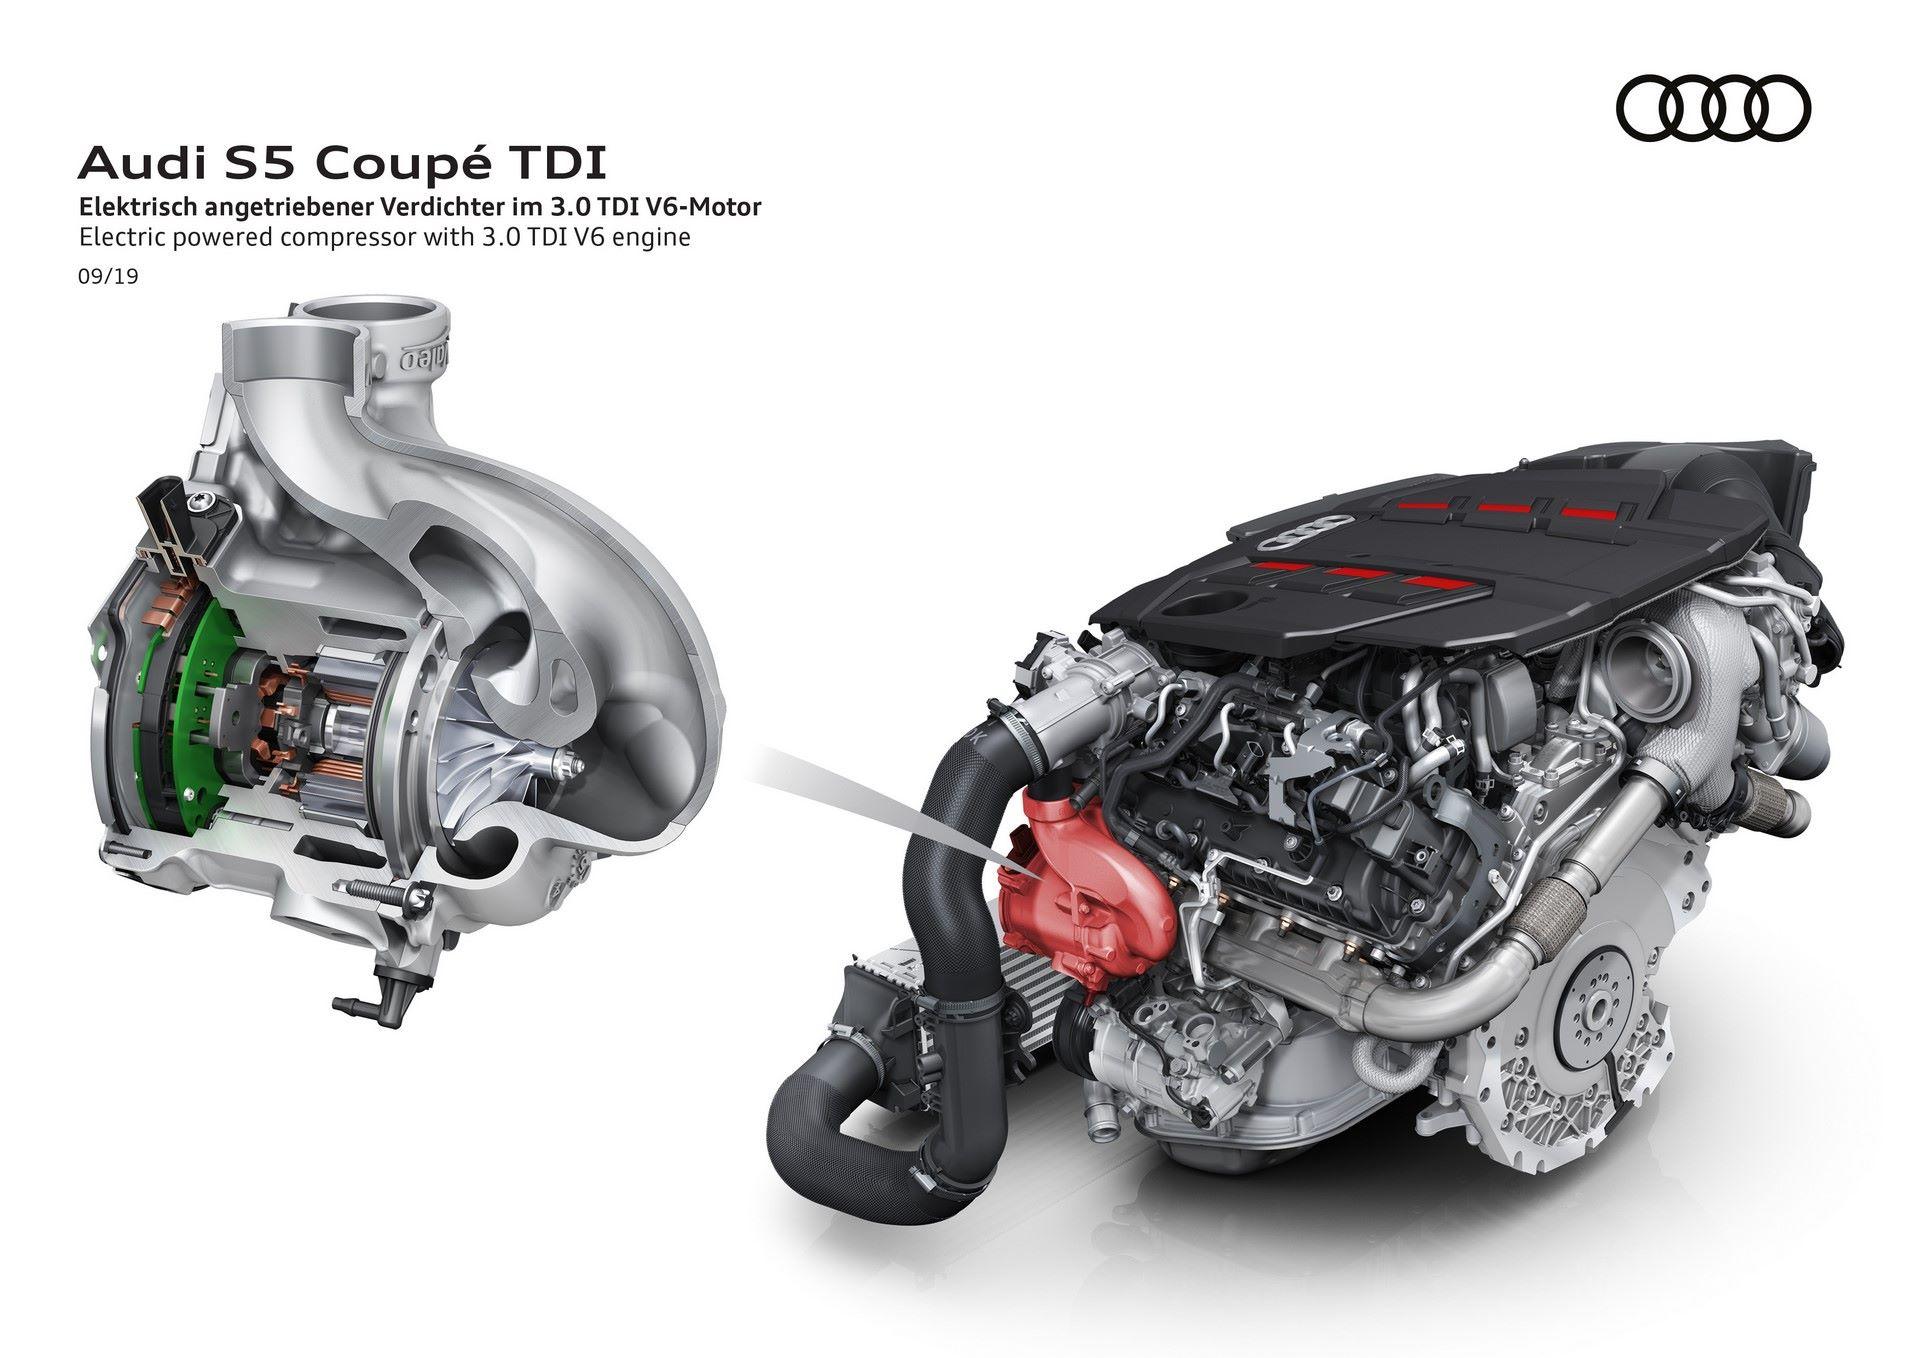 Audi S5 Coupé TDI